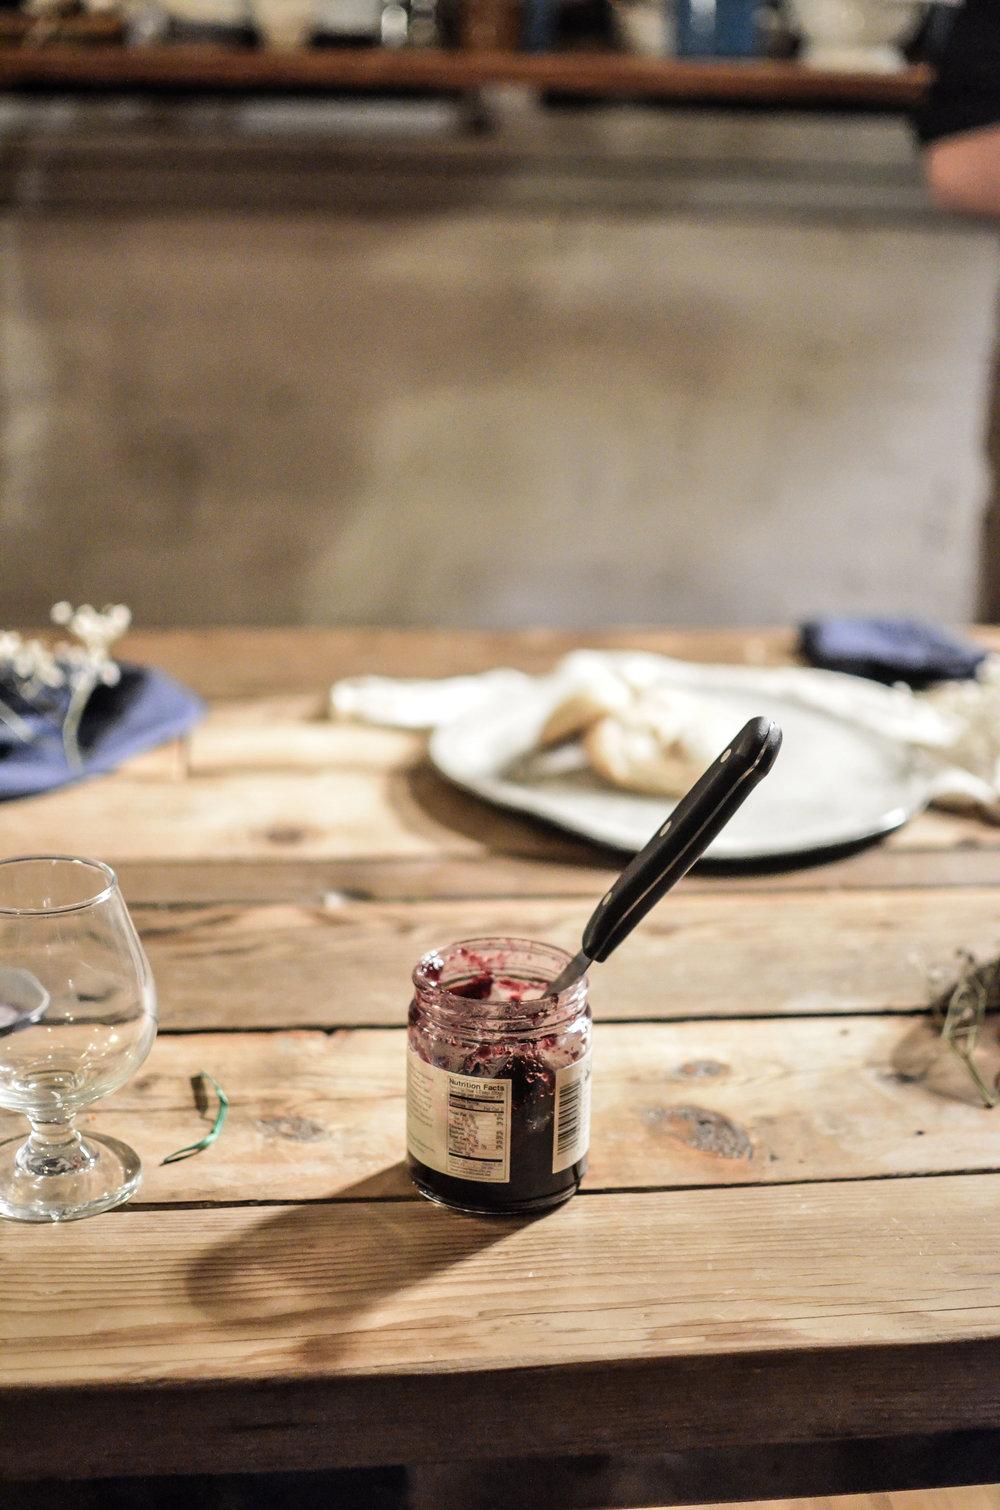 Wendling_Boyd_Harless_Hugh_Gathering_Food_Styling_Class-16.jpg